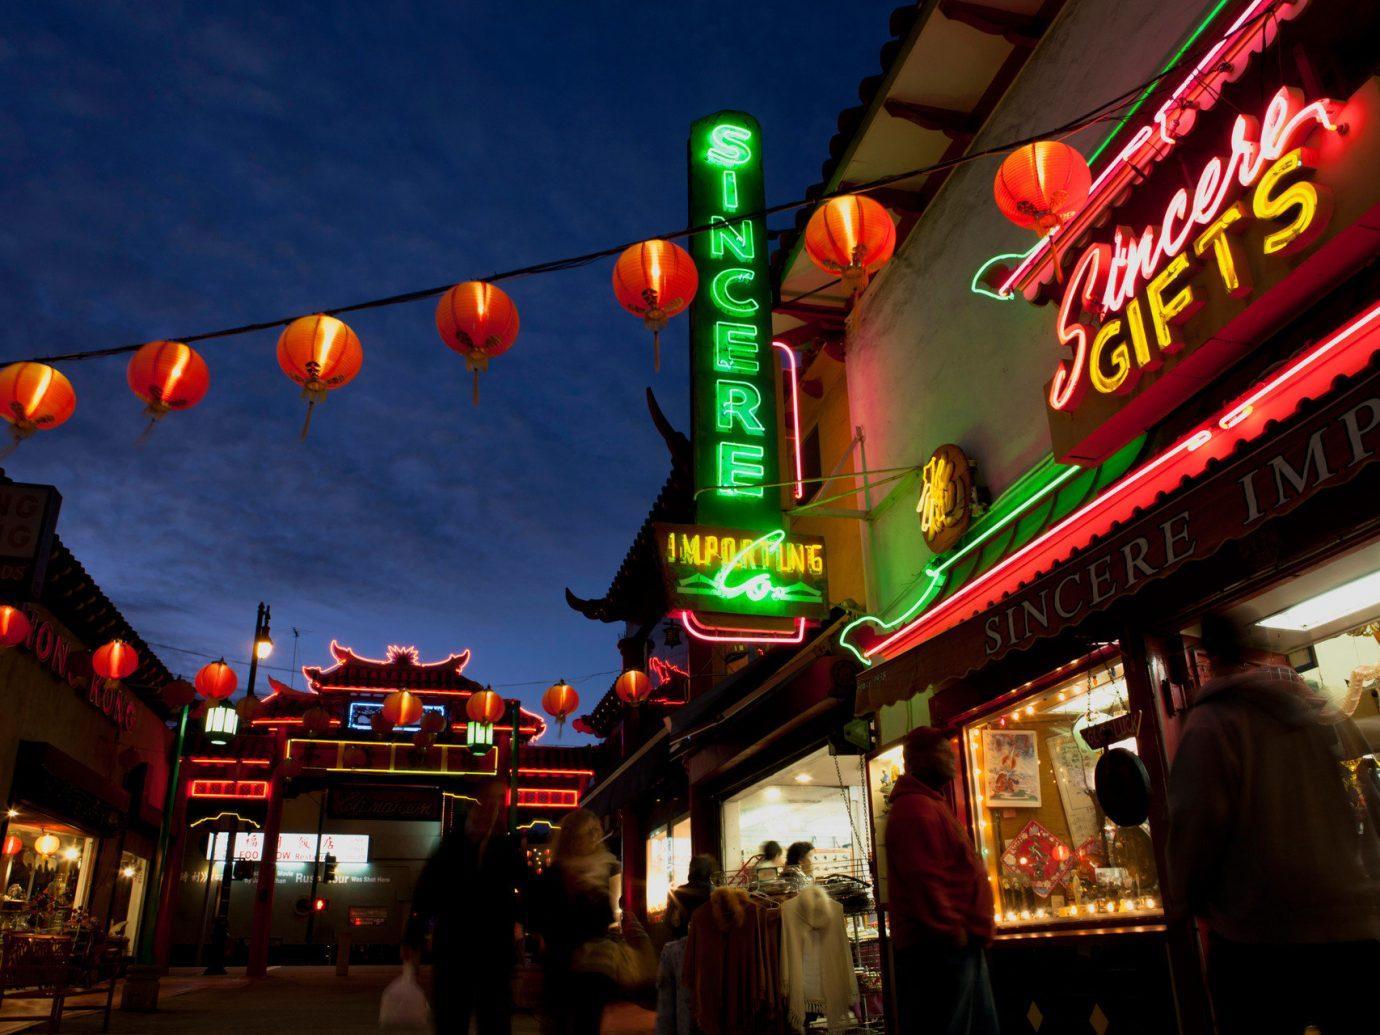 Trip Ideas outdoor night road amusement park street Christmas store